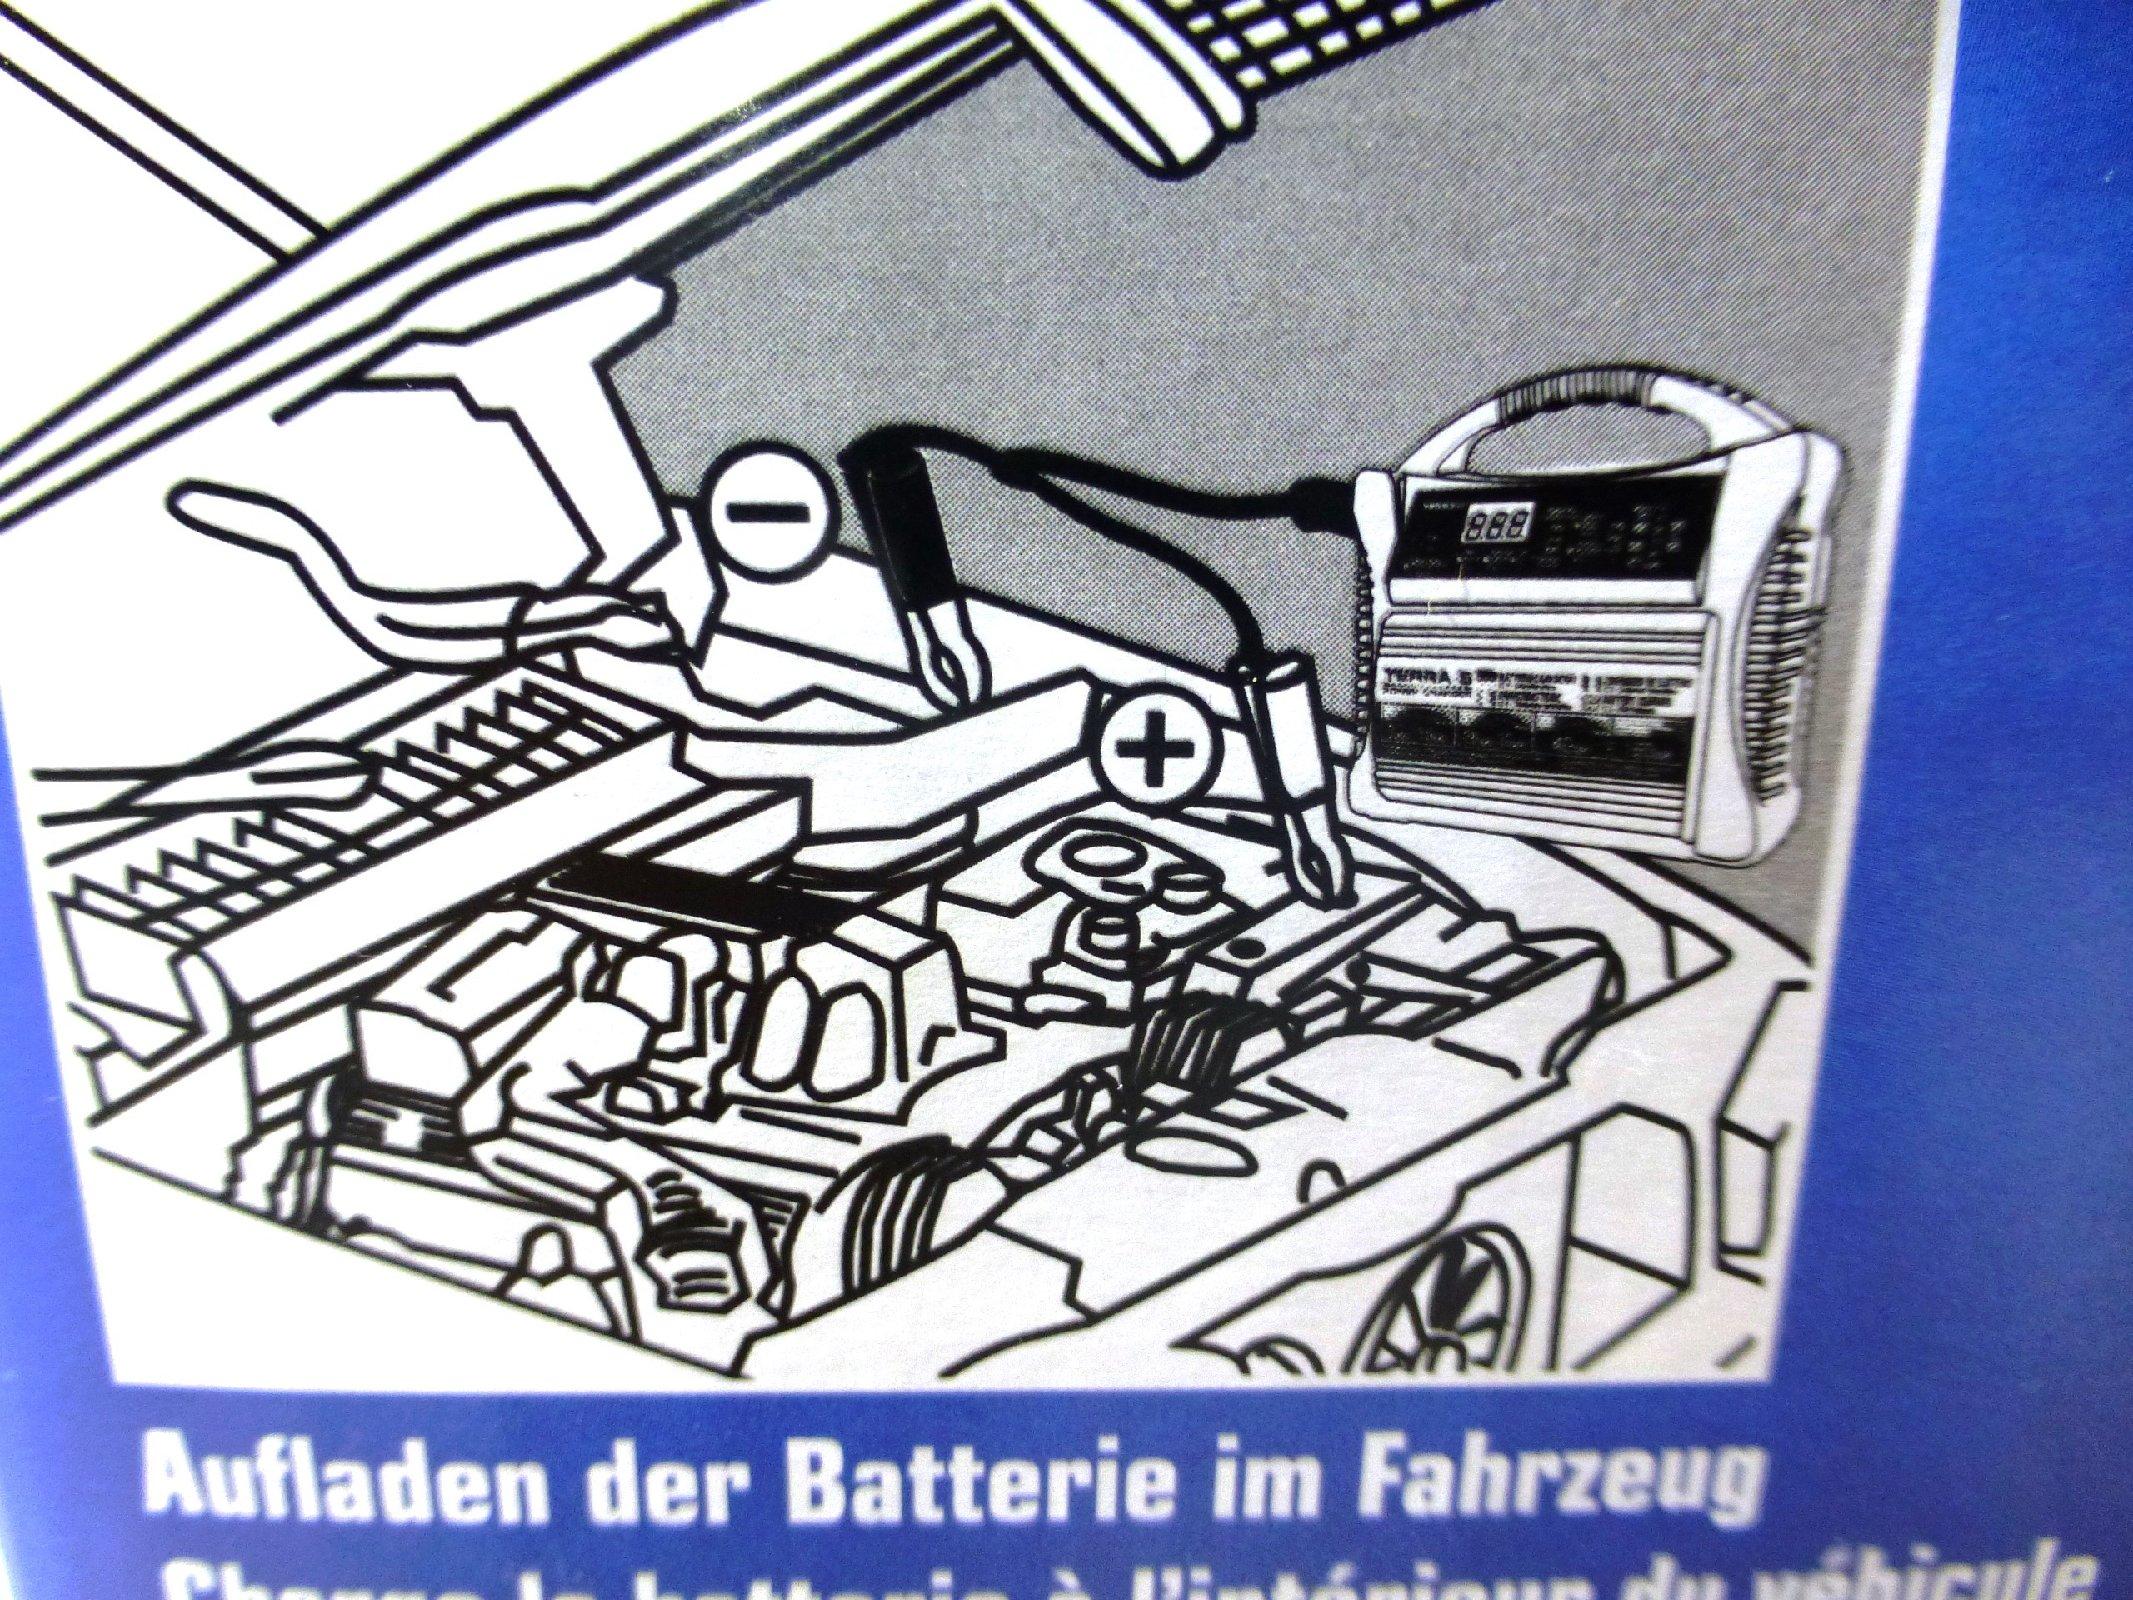 vollautomatisches 12v 40a batterieladeger t m motor. Black Bedroom Furniture Sets. Home Design Ideas